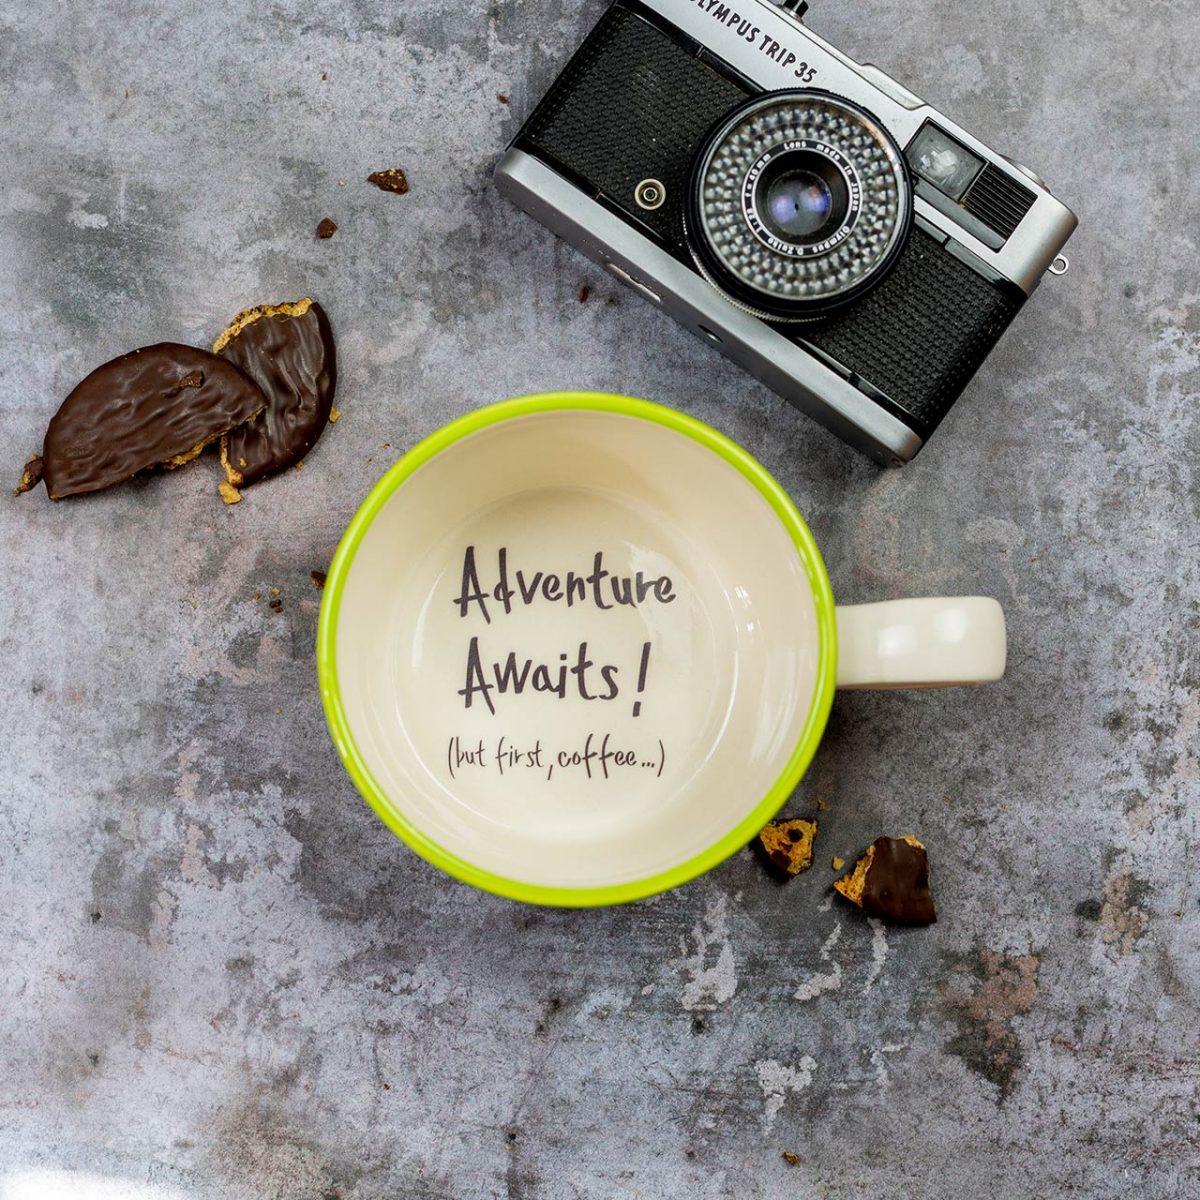 Adventure awaits, but first coffee Handmade Mug Gift